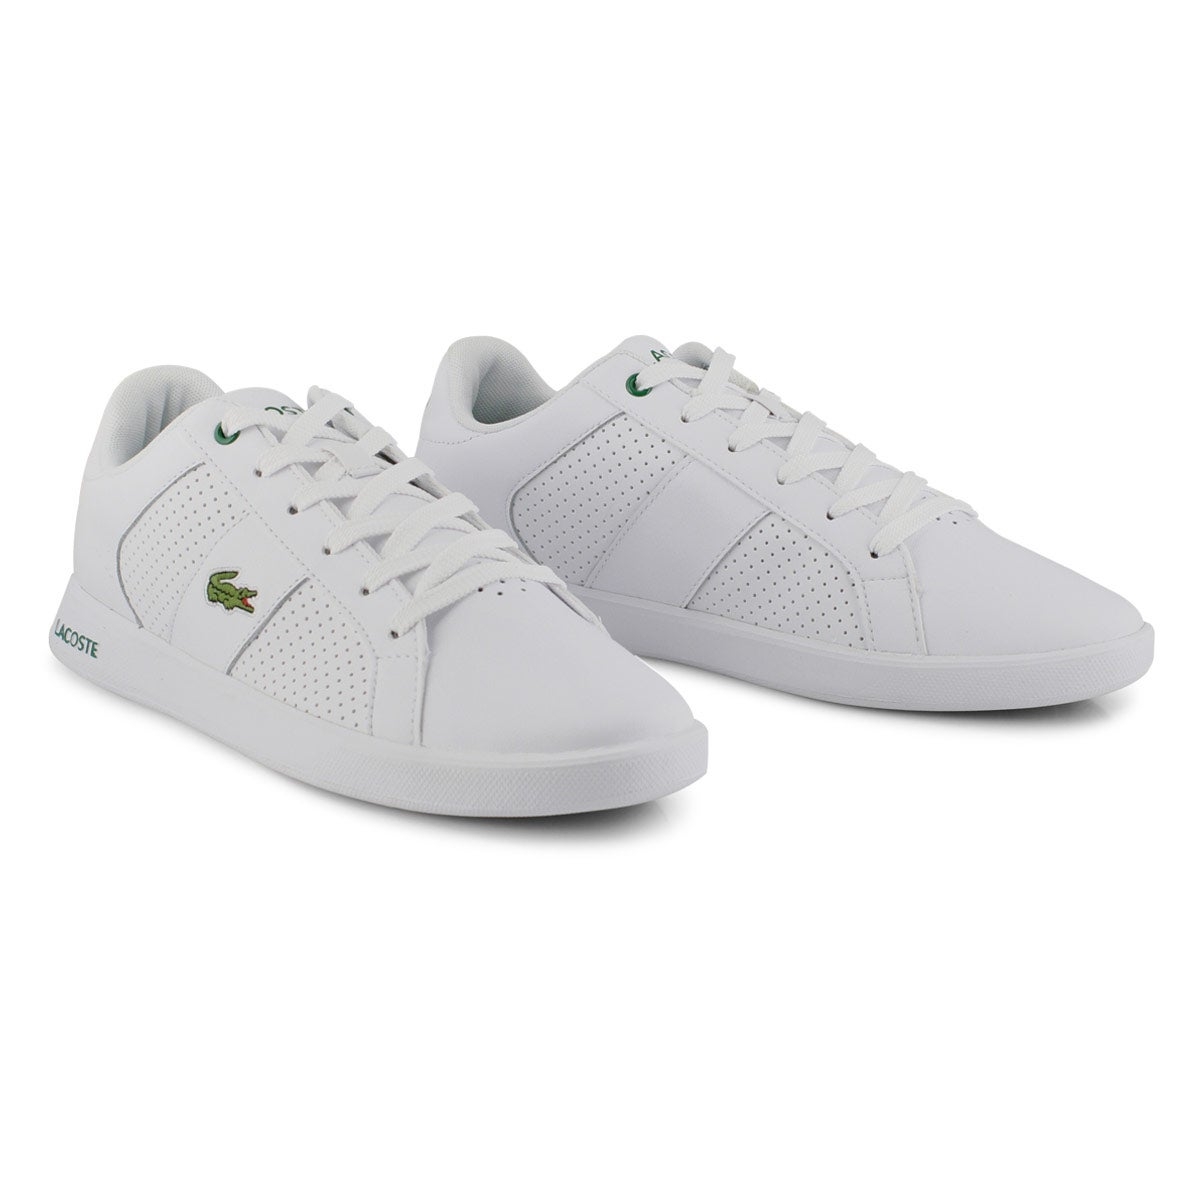 Mns Novas 120 1P SMA wht sneaker